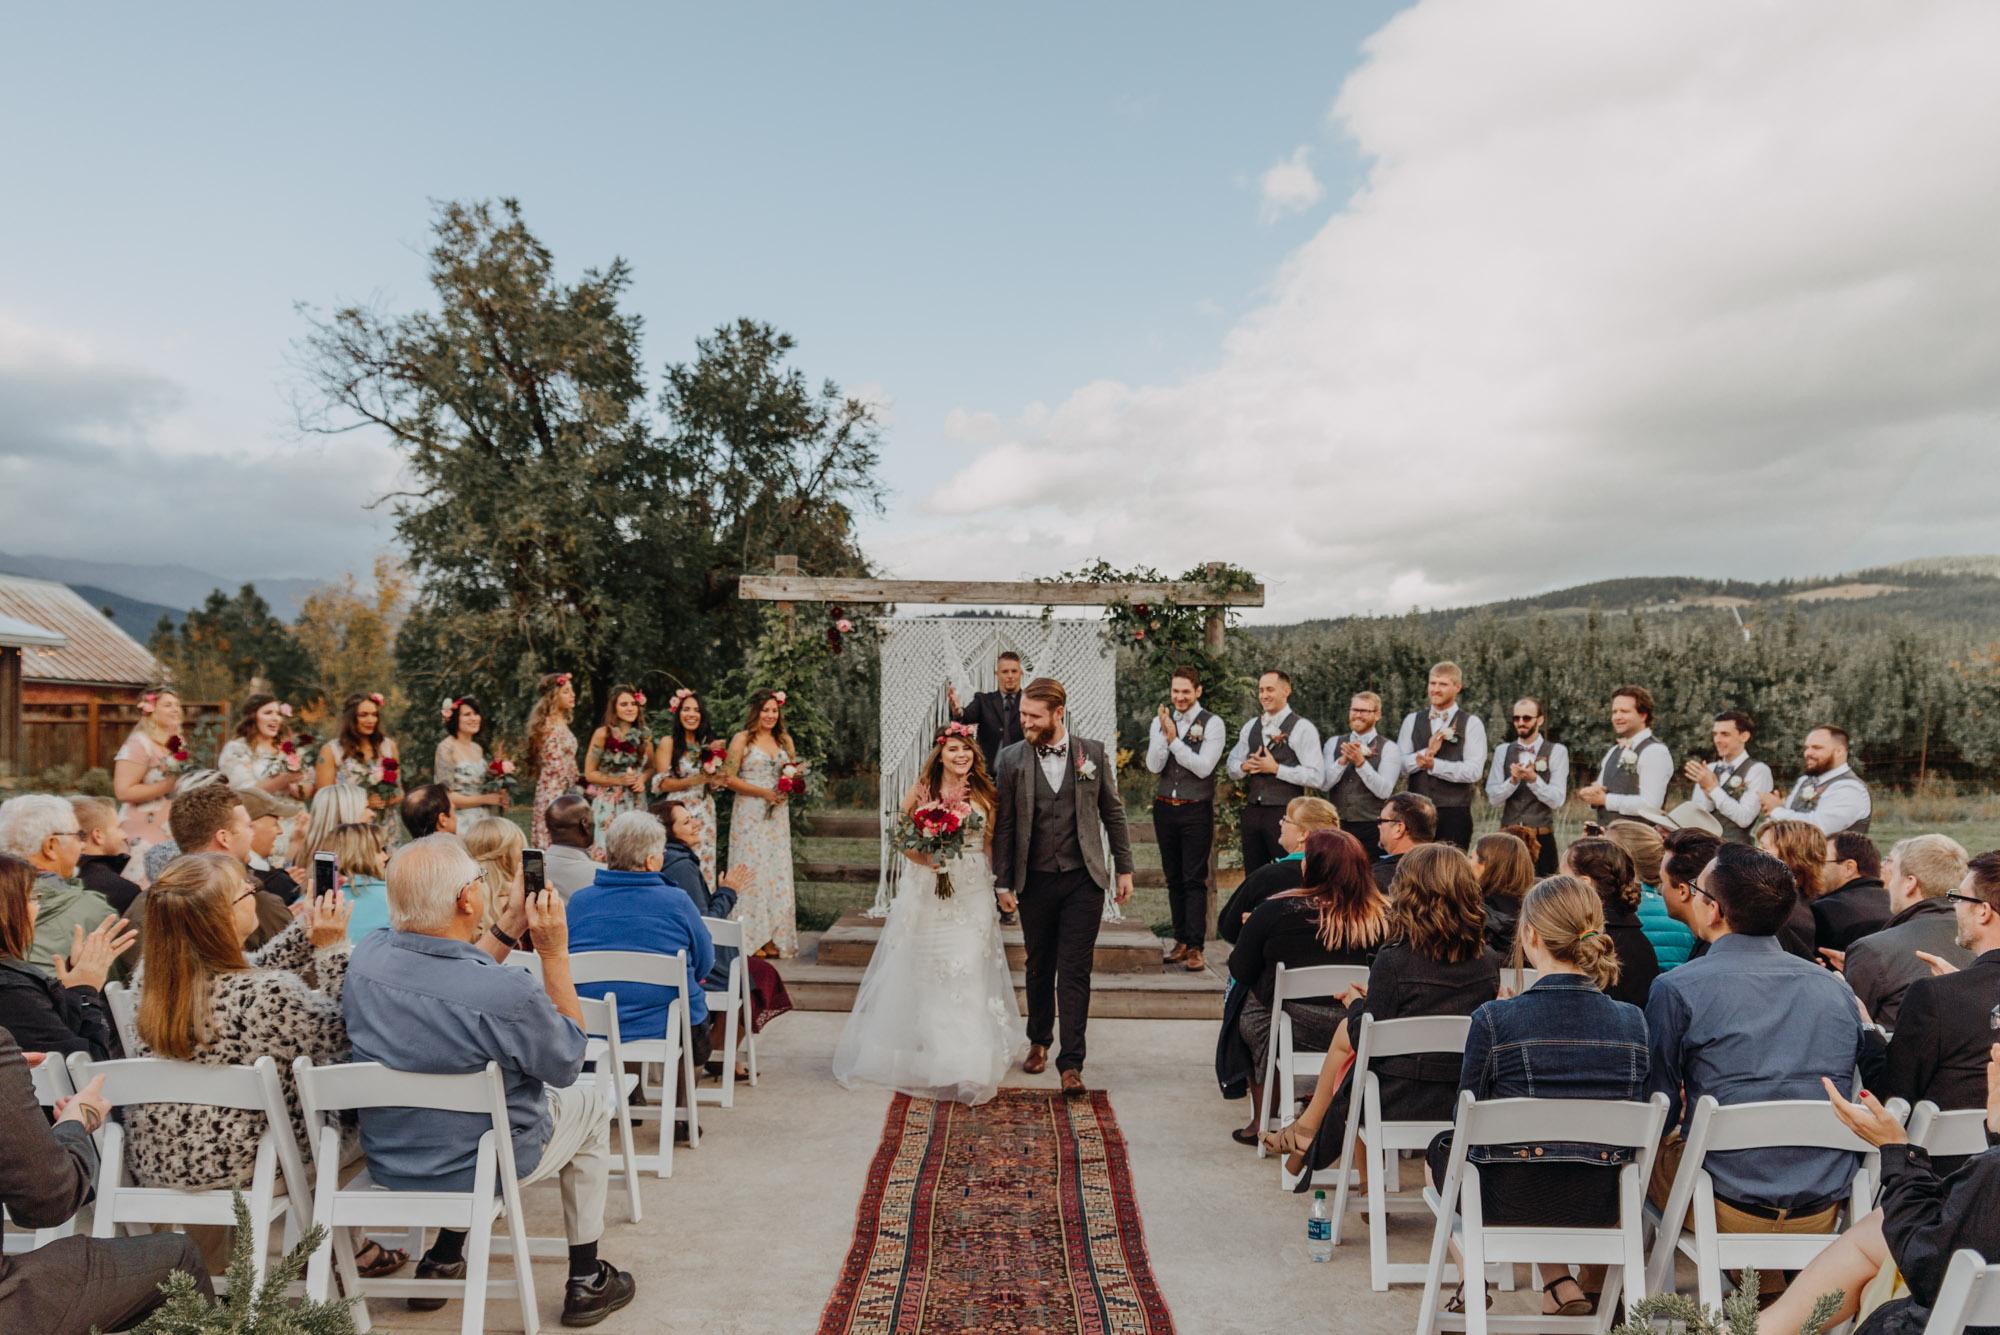 Outdoor-Summer-Ceremony-Washington-Wedding-Rainbow-5433.jpg